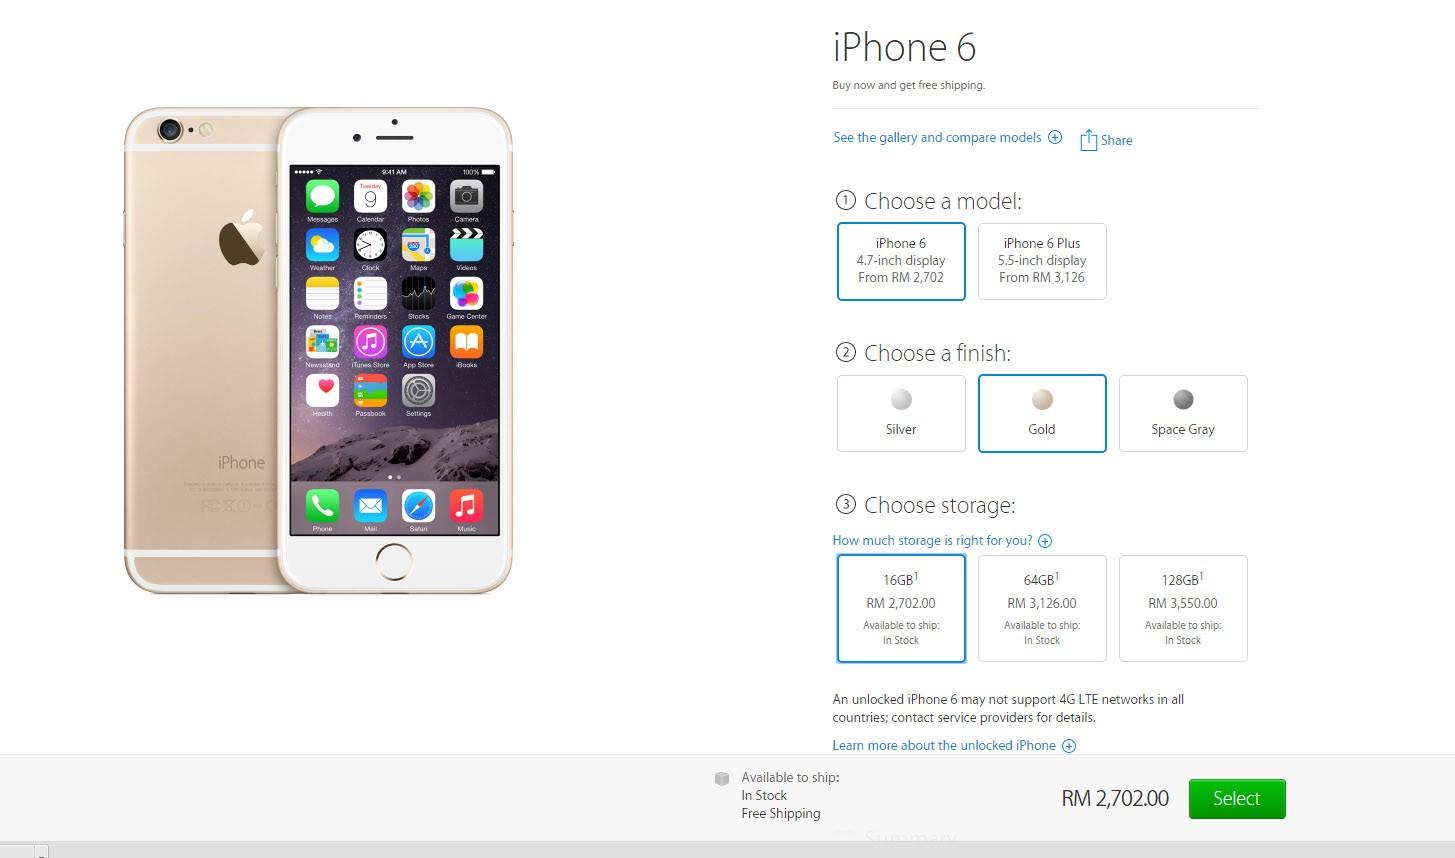 iphone 6 gst